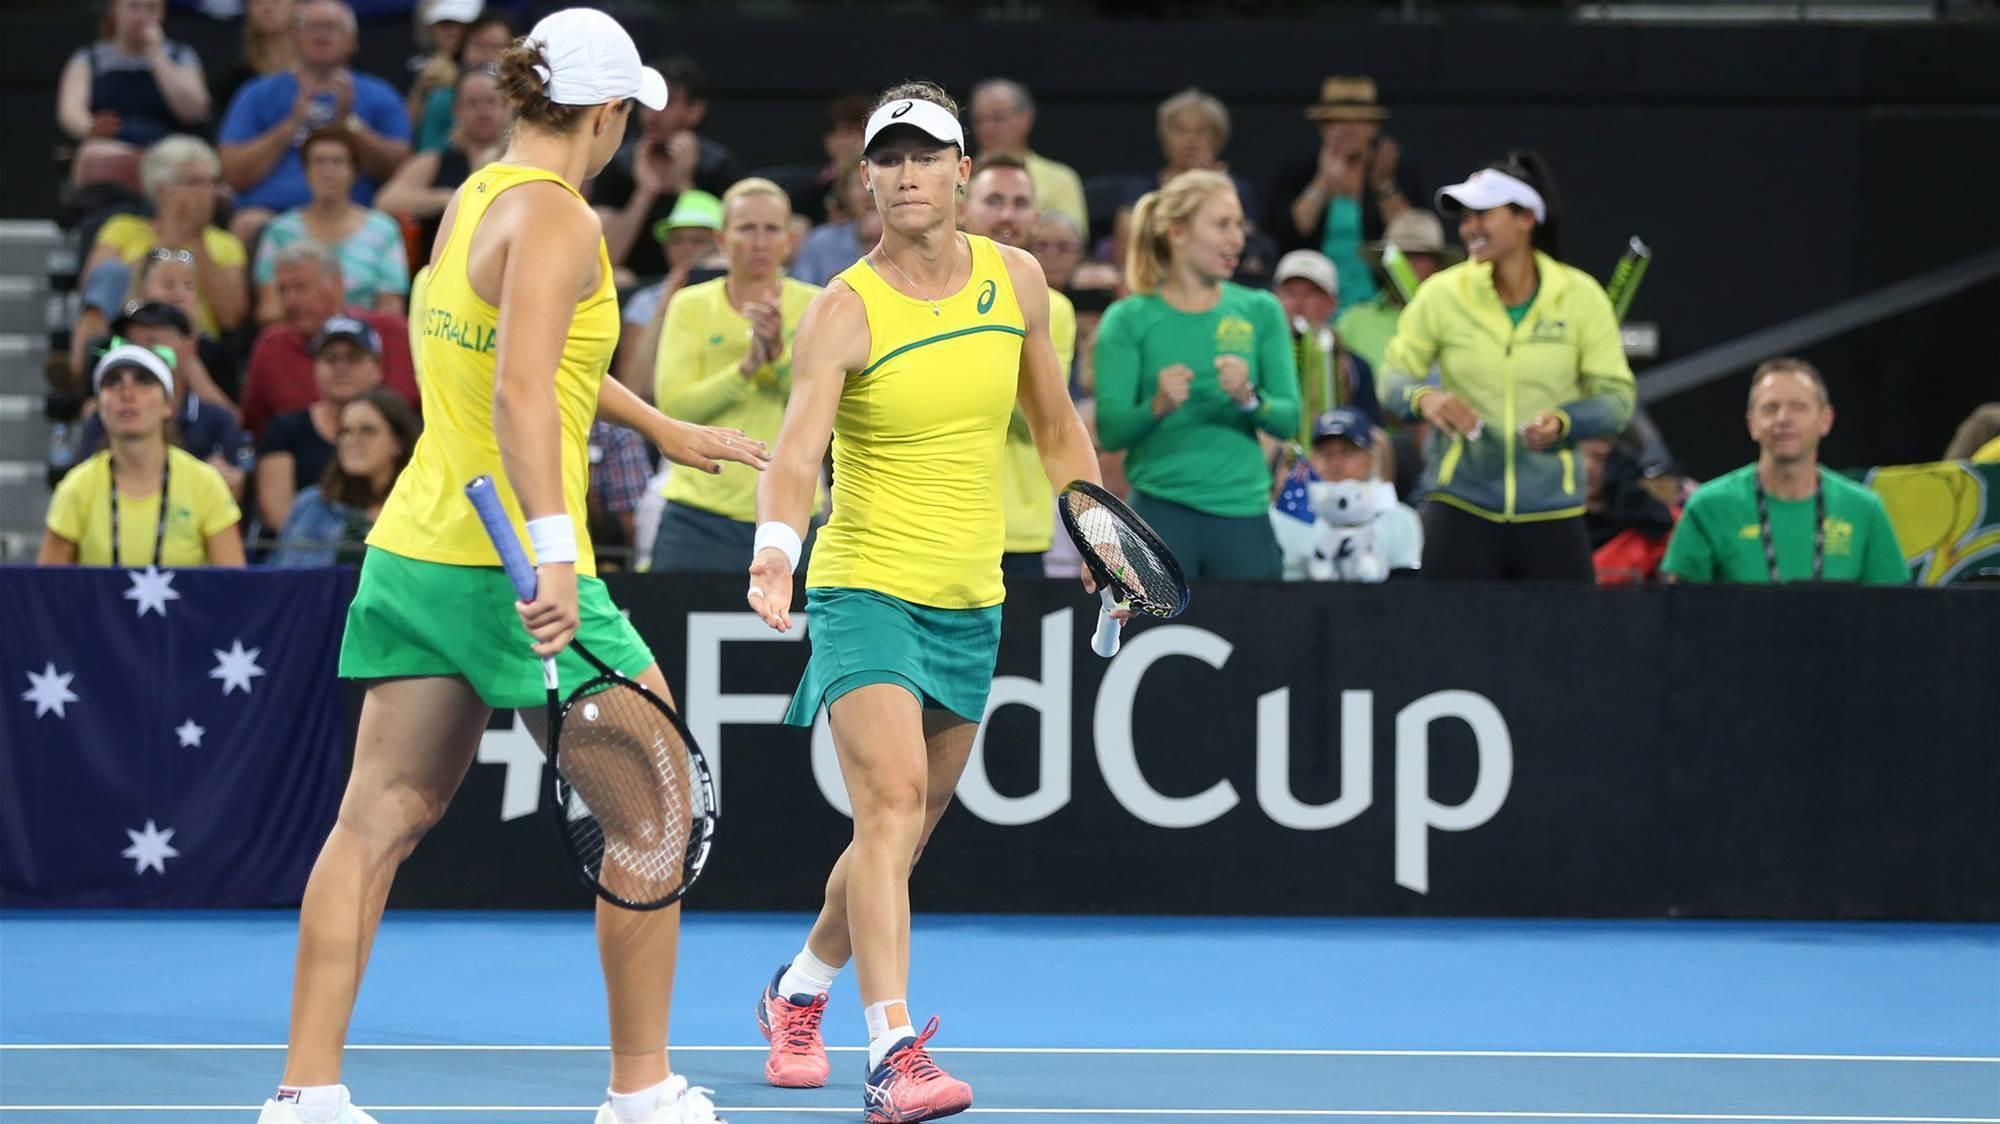 Australia break 26-year Fed Cup drought